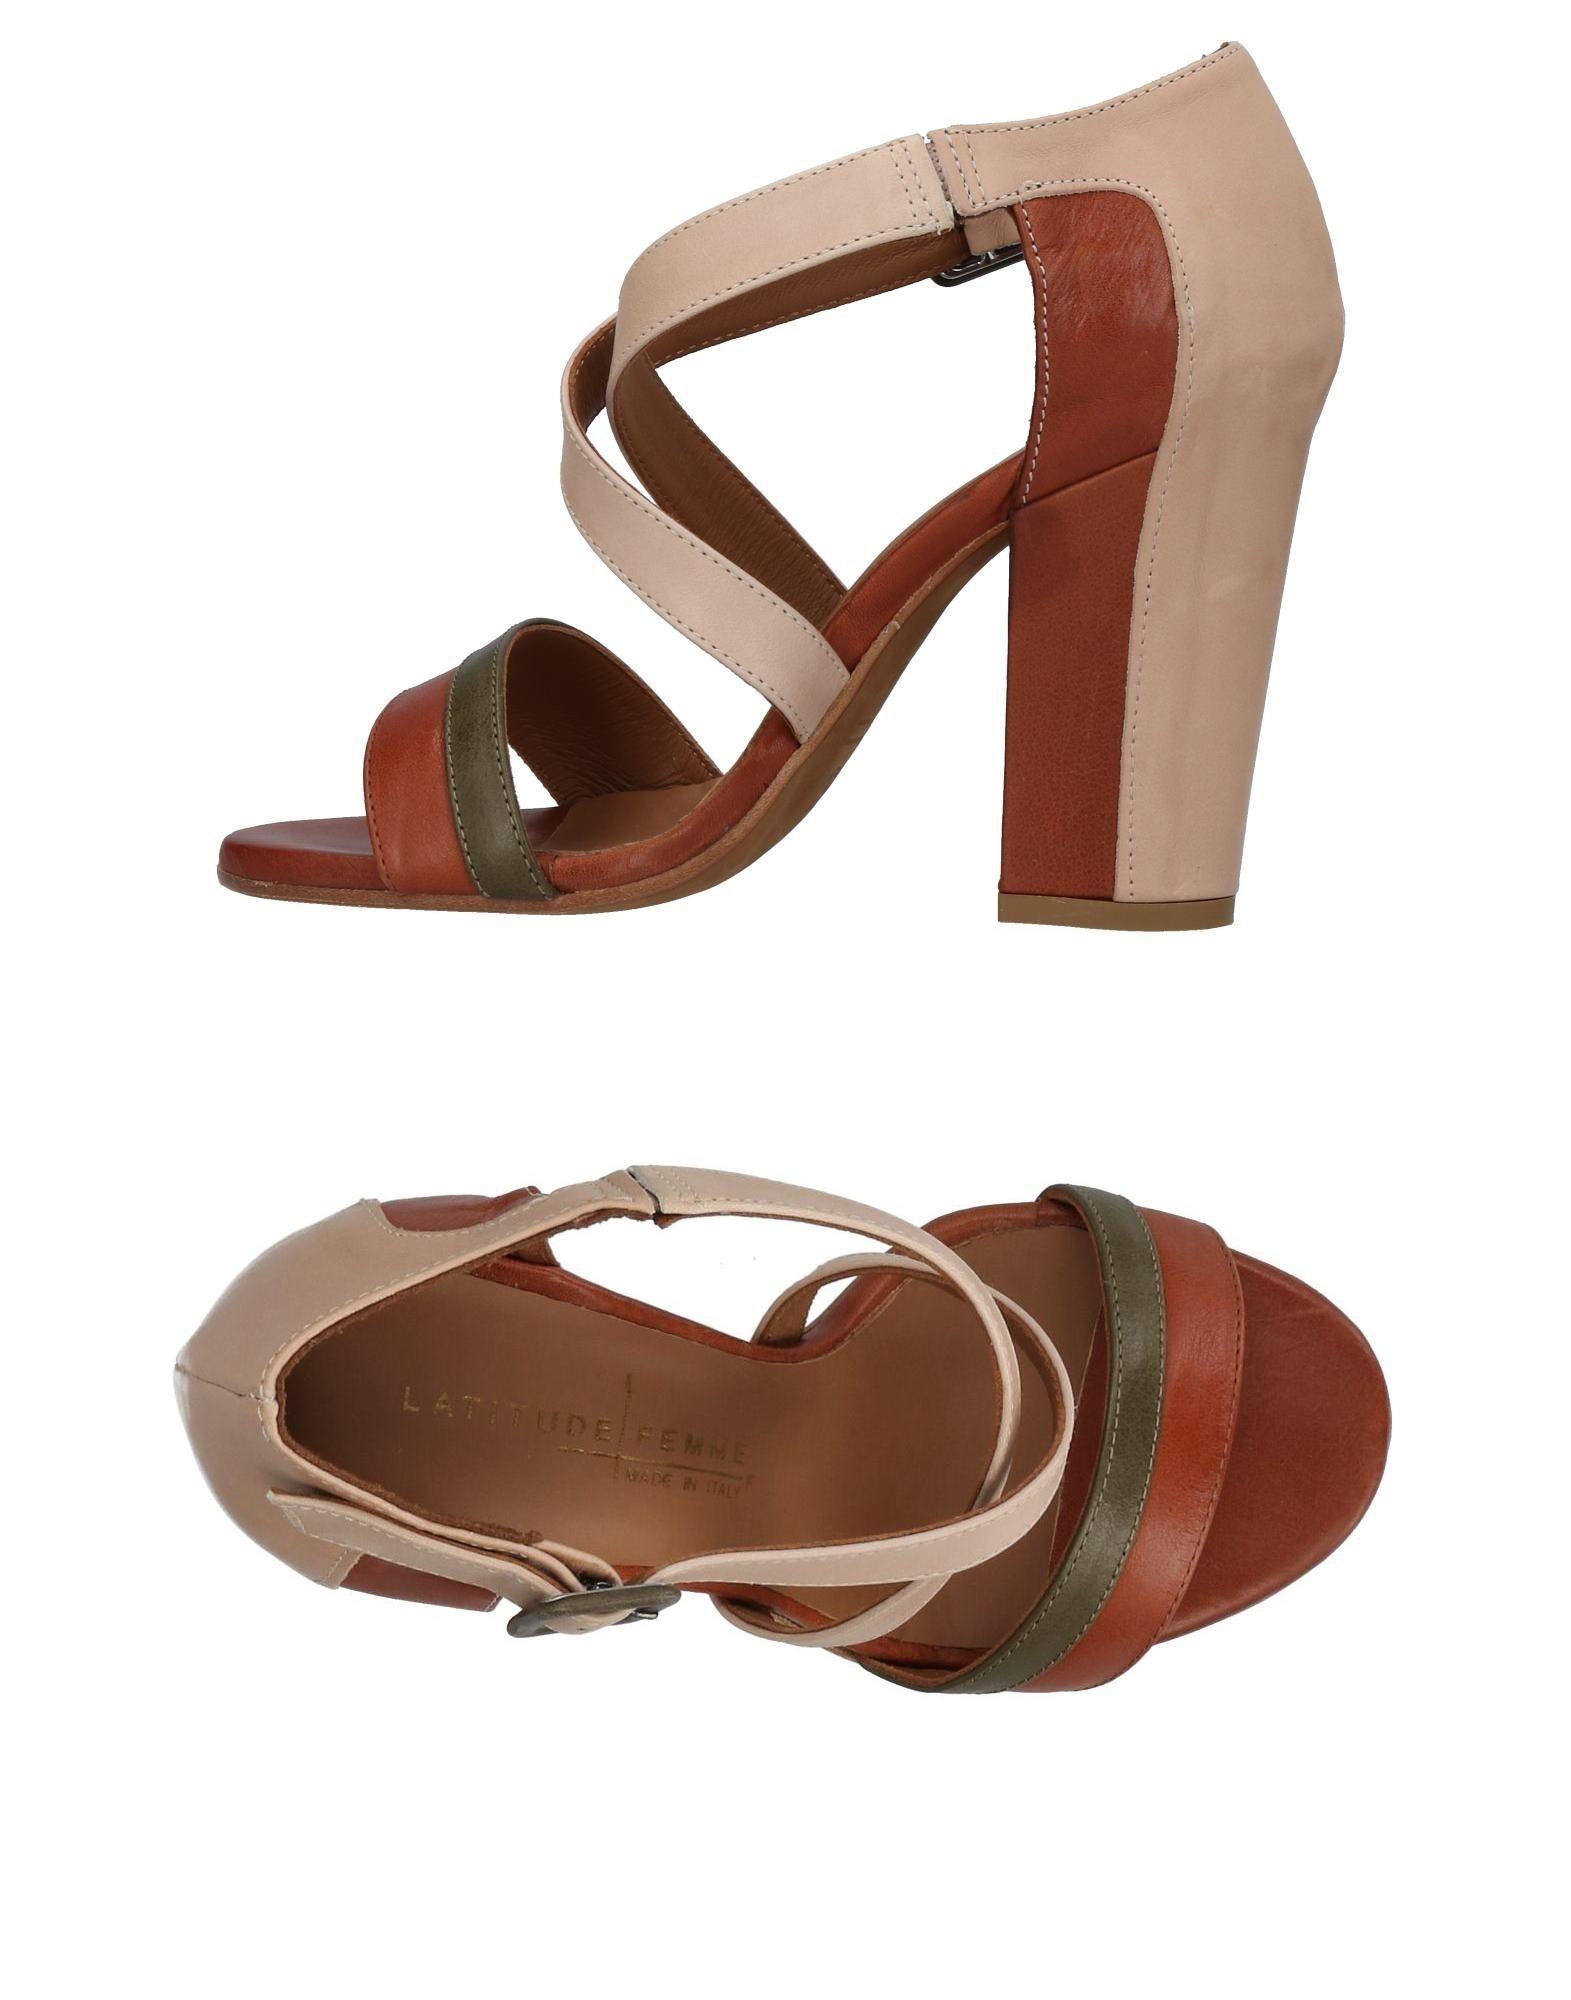 Latitude Femme Sandalen Damen  11435161XX Gute Qualität beliebte Schuhe